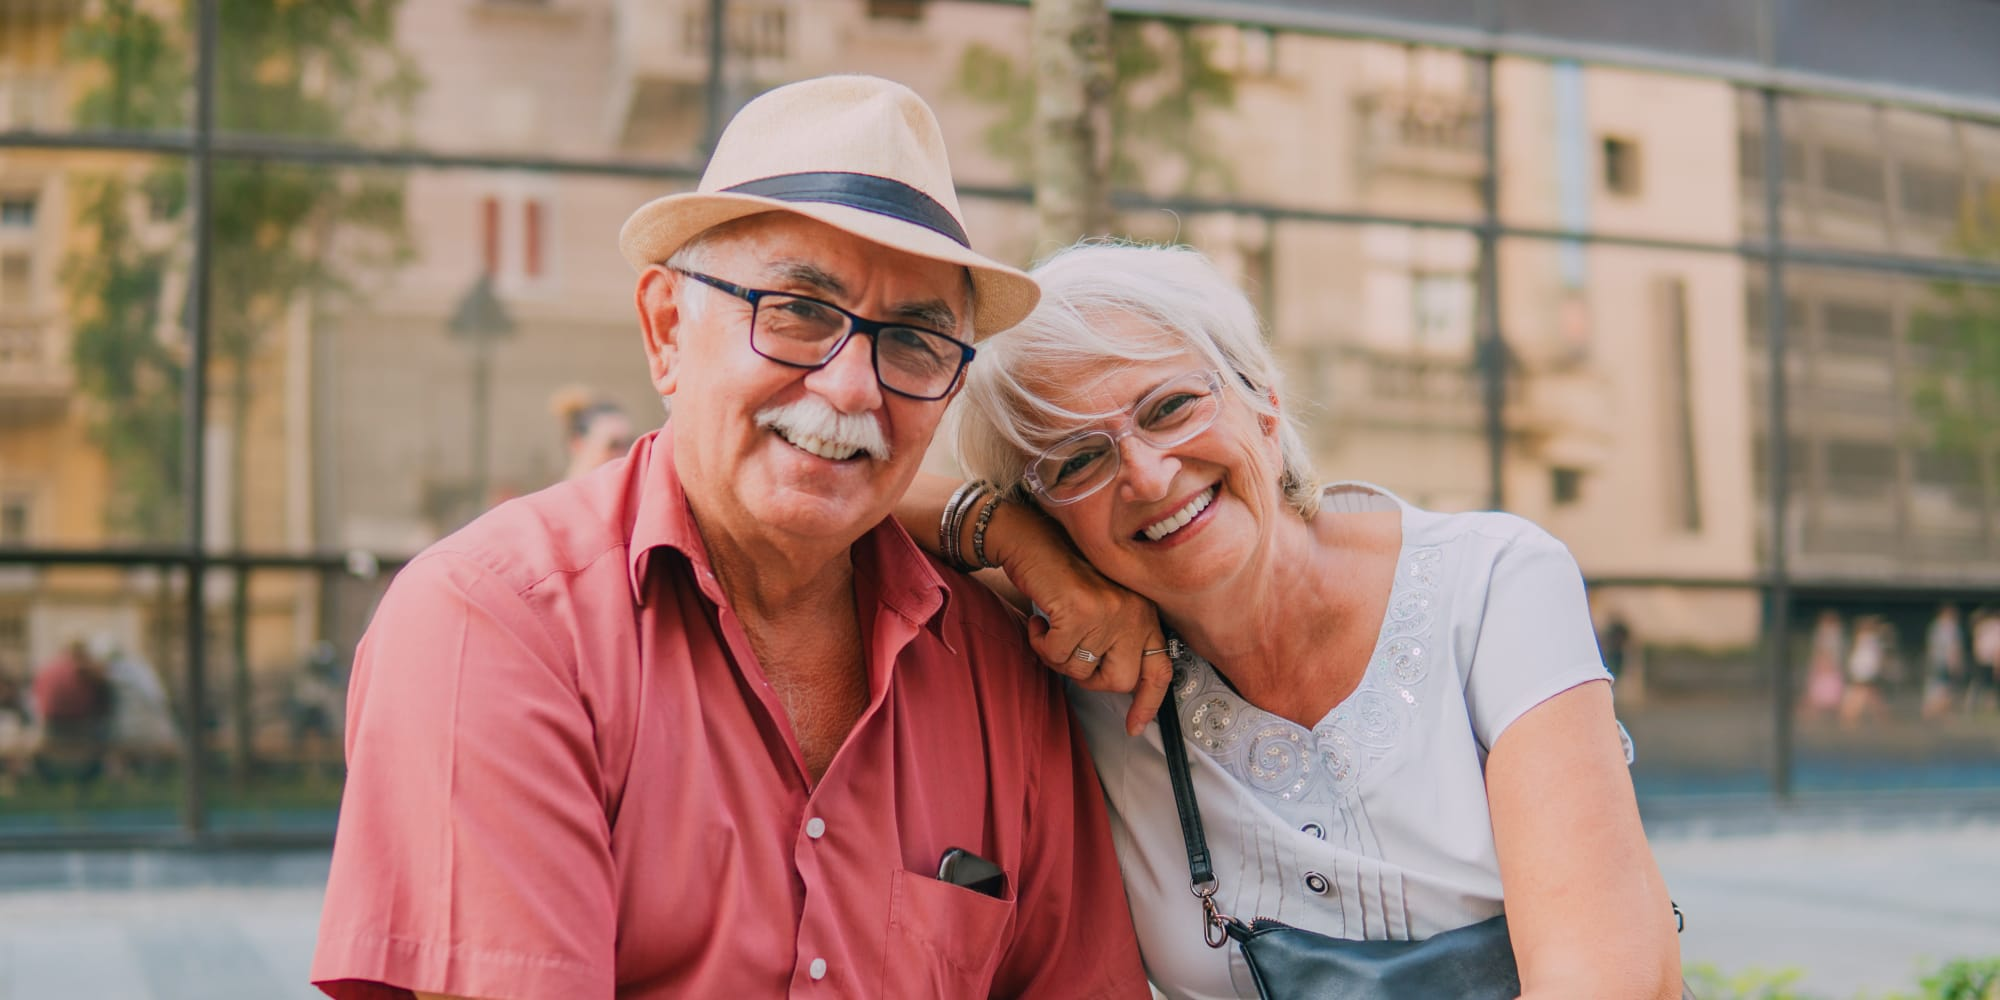 Vibrant senior living at Aurora on France in Edina, Minnesota